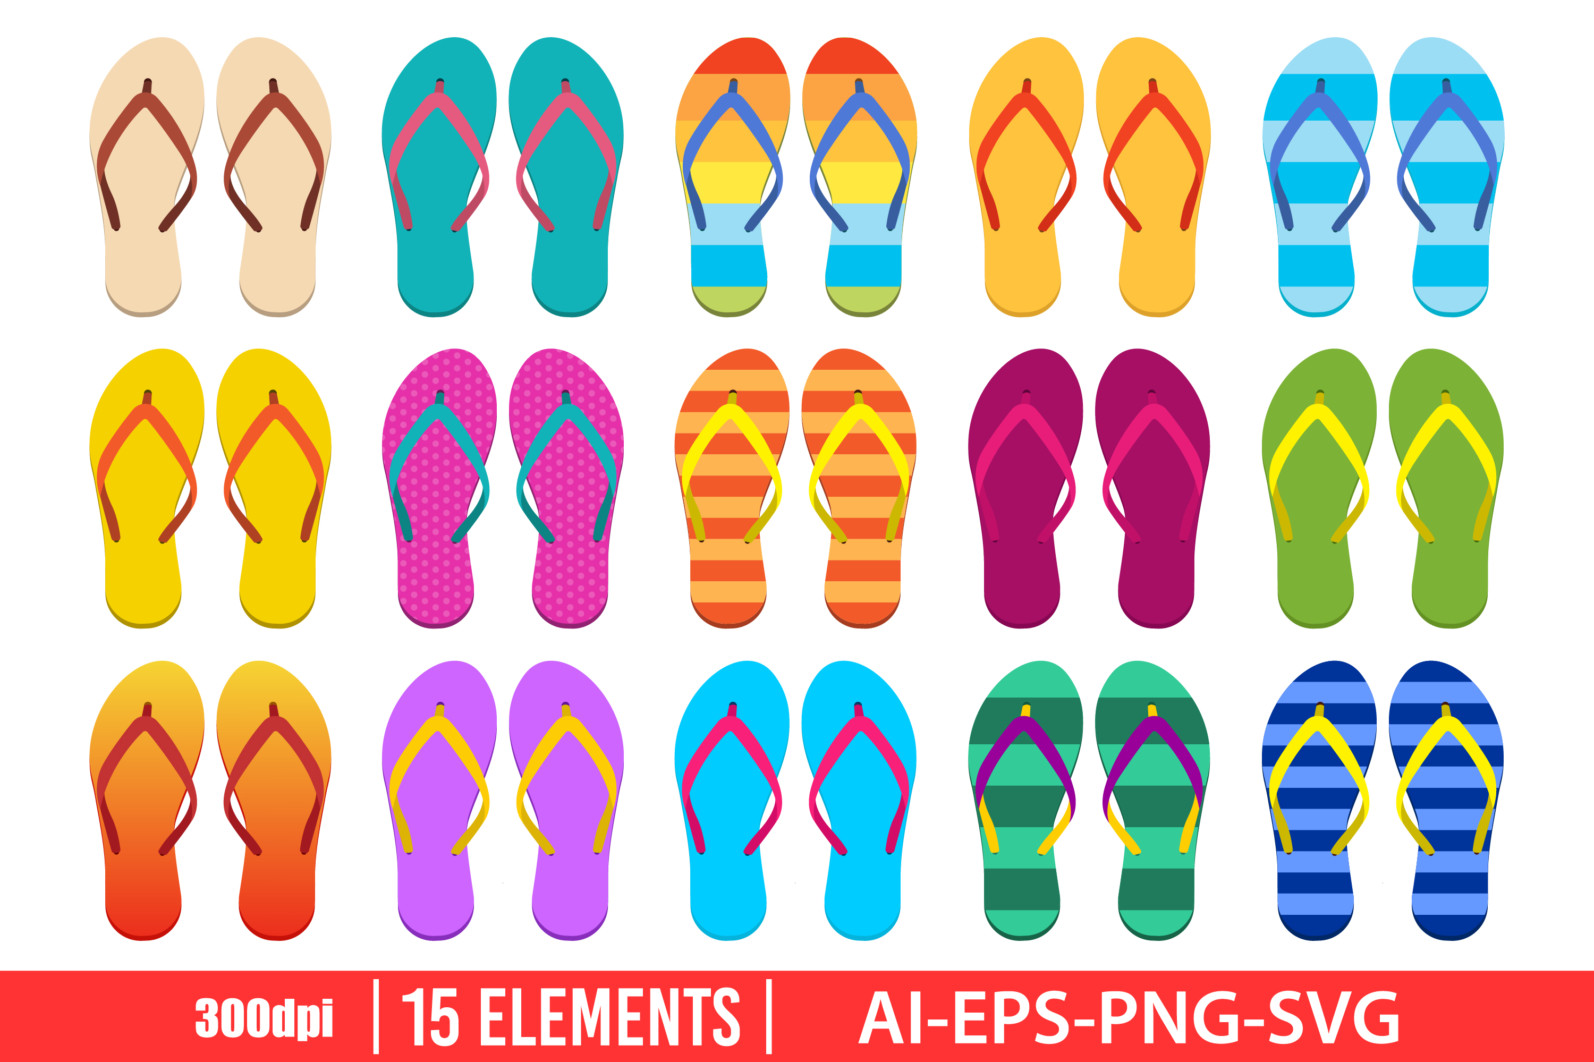 Flip flops clipart vector design illustration. Flip flops set. Vector Clipart Print - FLIP FLOPS 2 scaled -